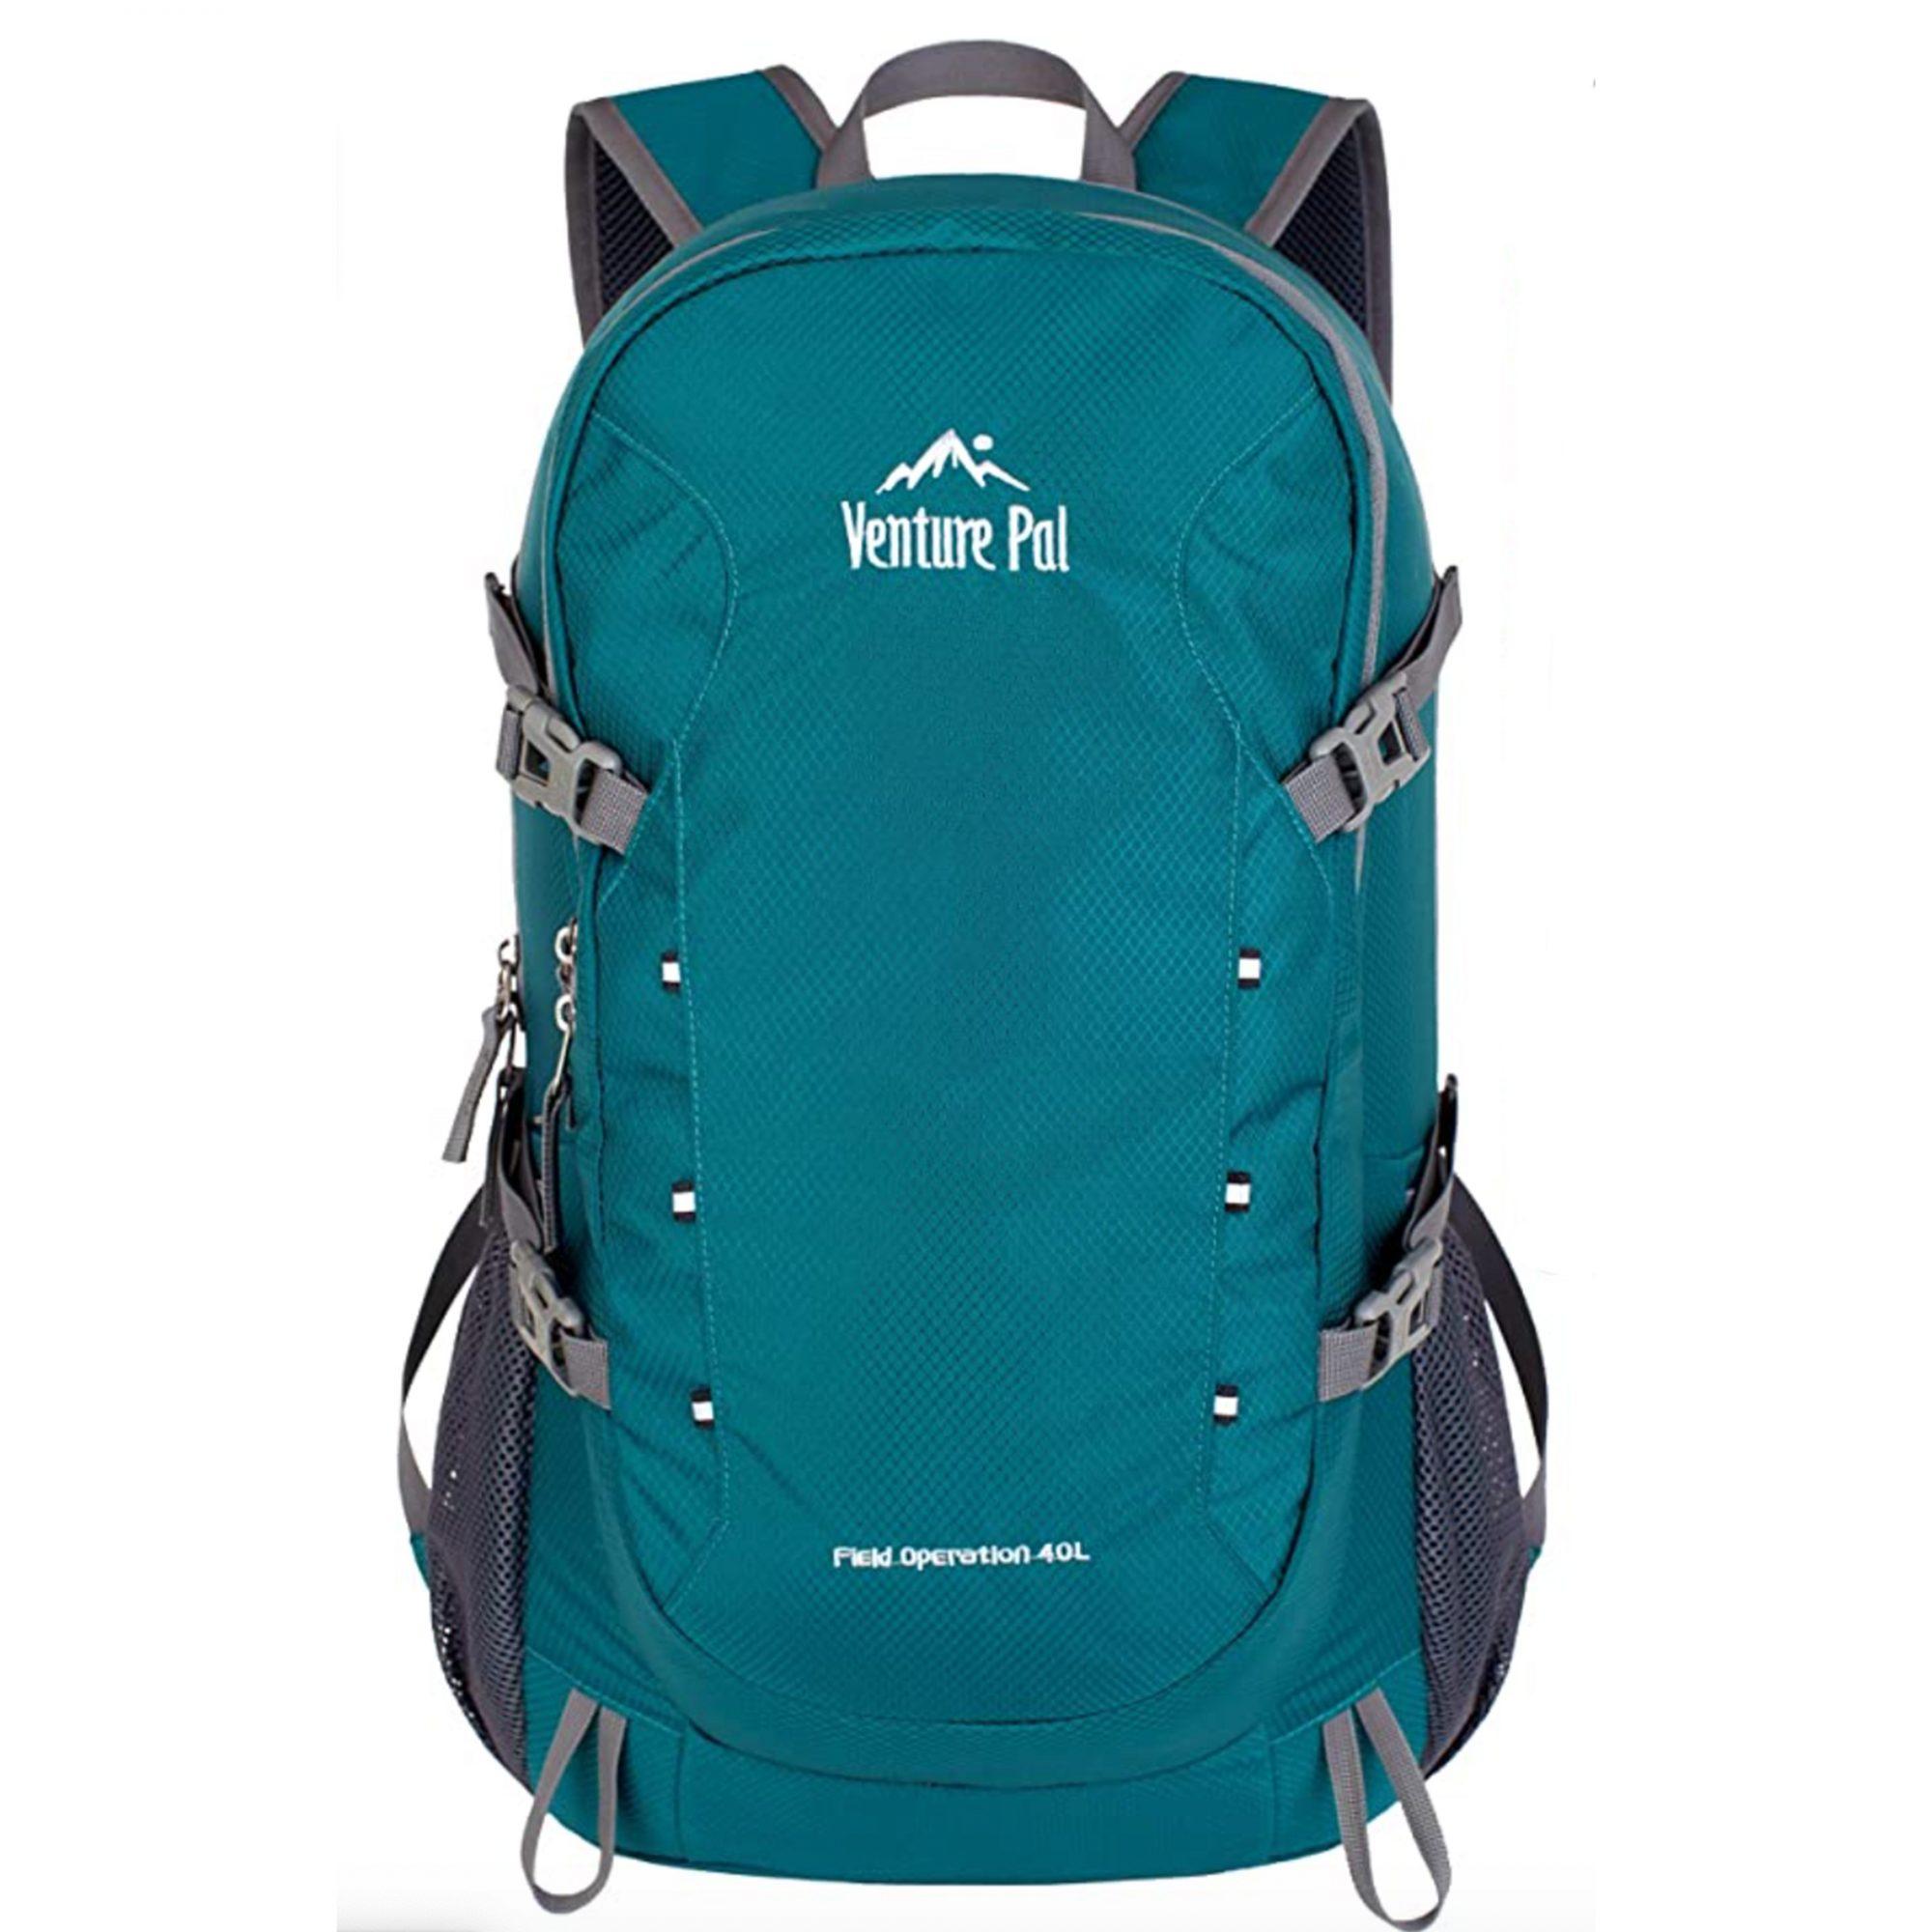 venture-pal-backpack